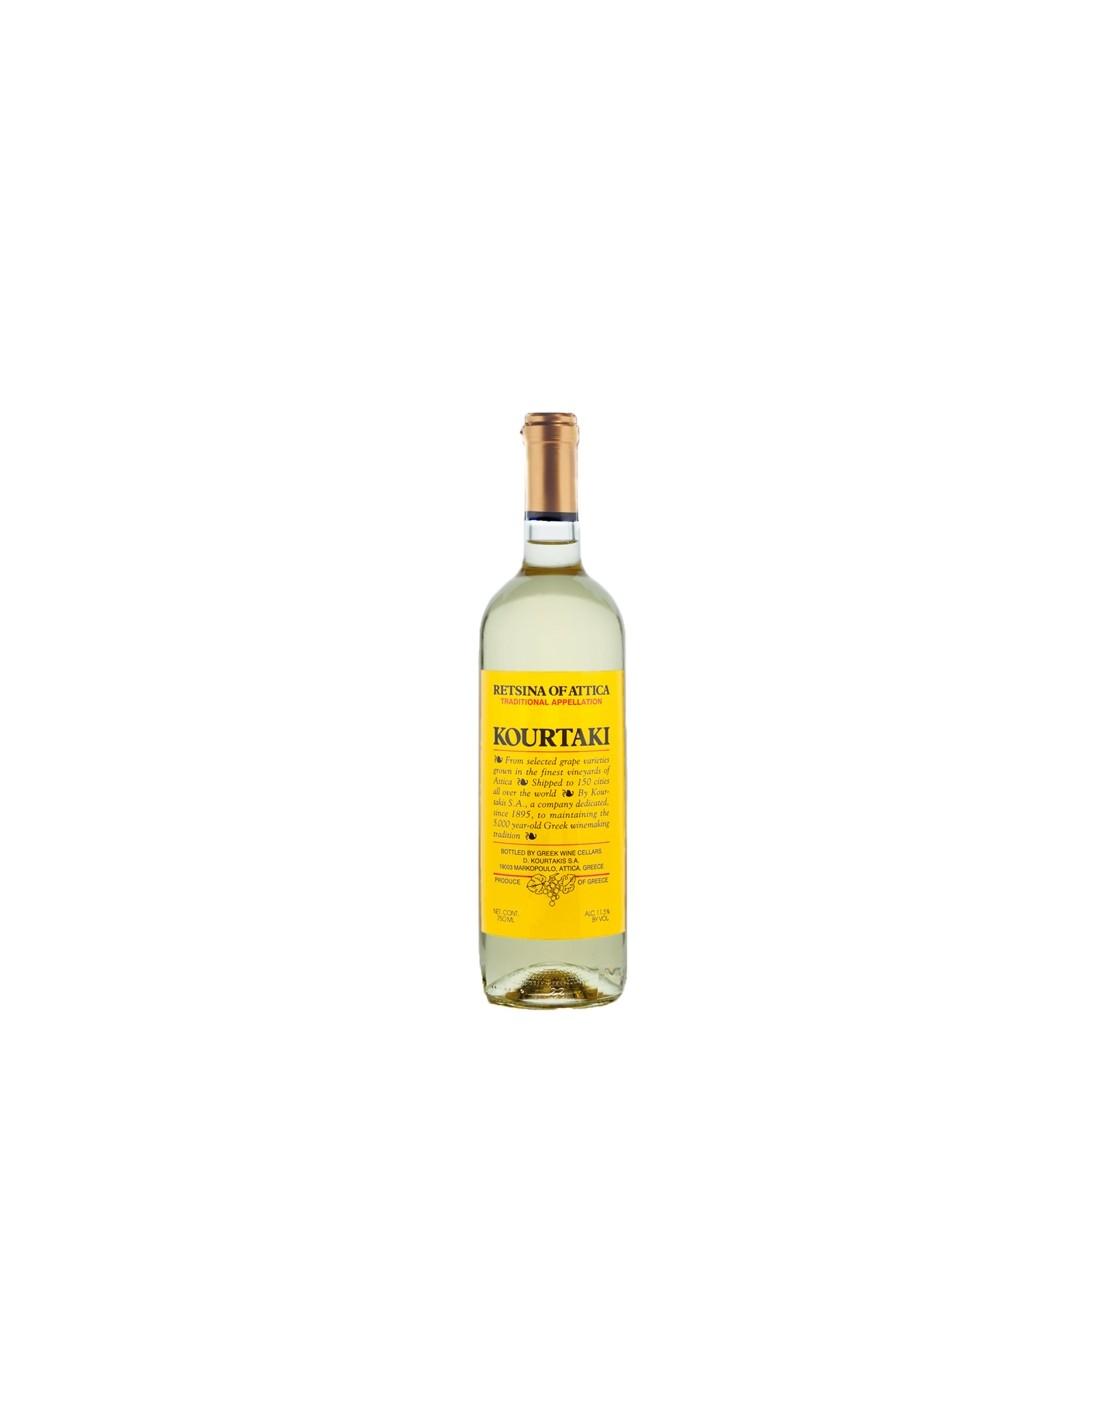 Vin alb, Cupaj, Kourtaki Retsina of Attika, 0.75L, 11.5% alc., Grecia